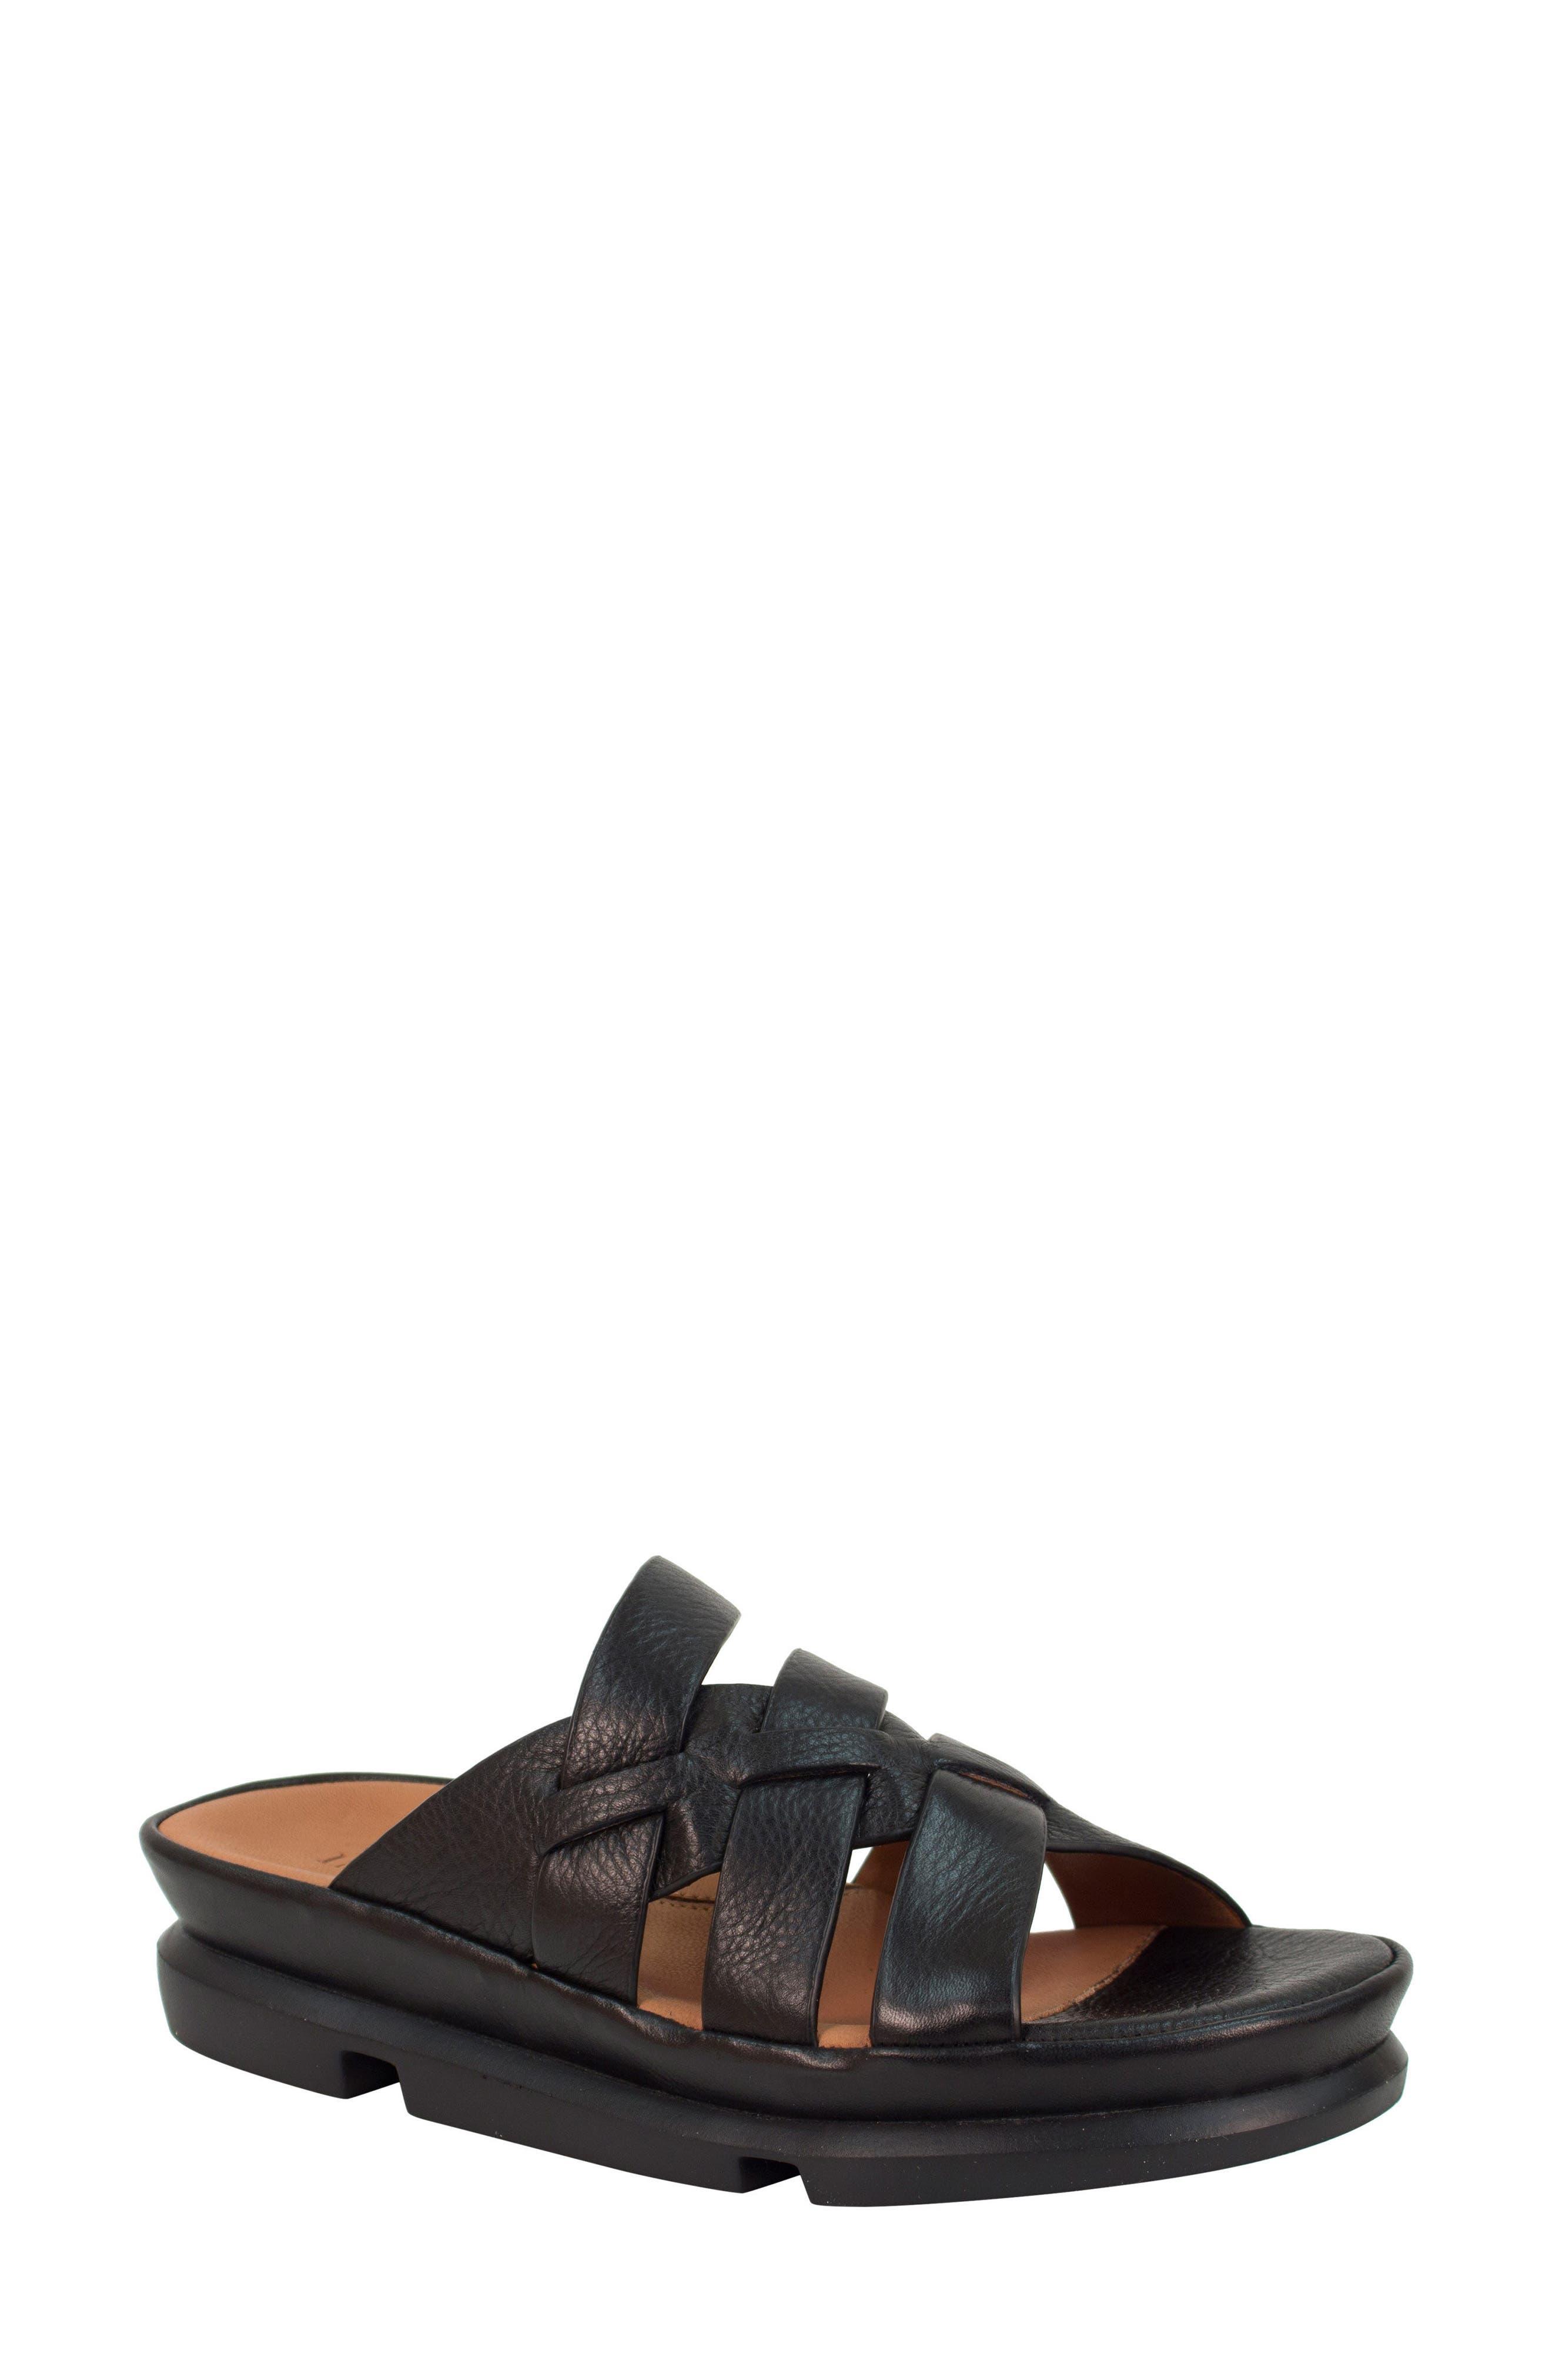 Veryl Sandal,                             Main thumbnail 1, color,                             Black Leather